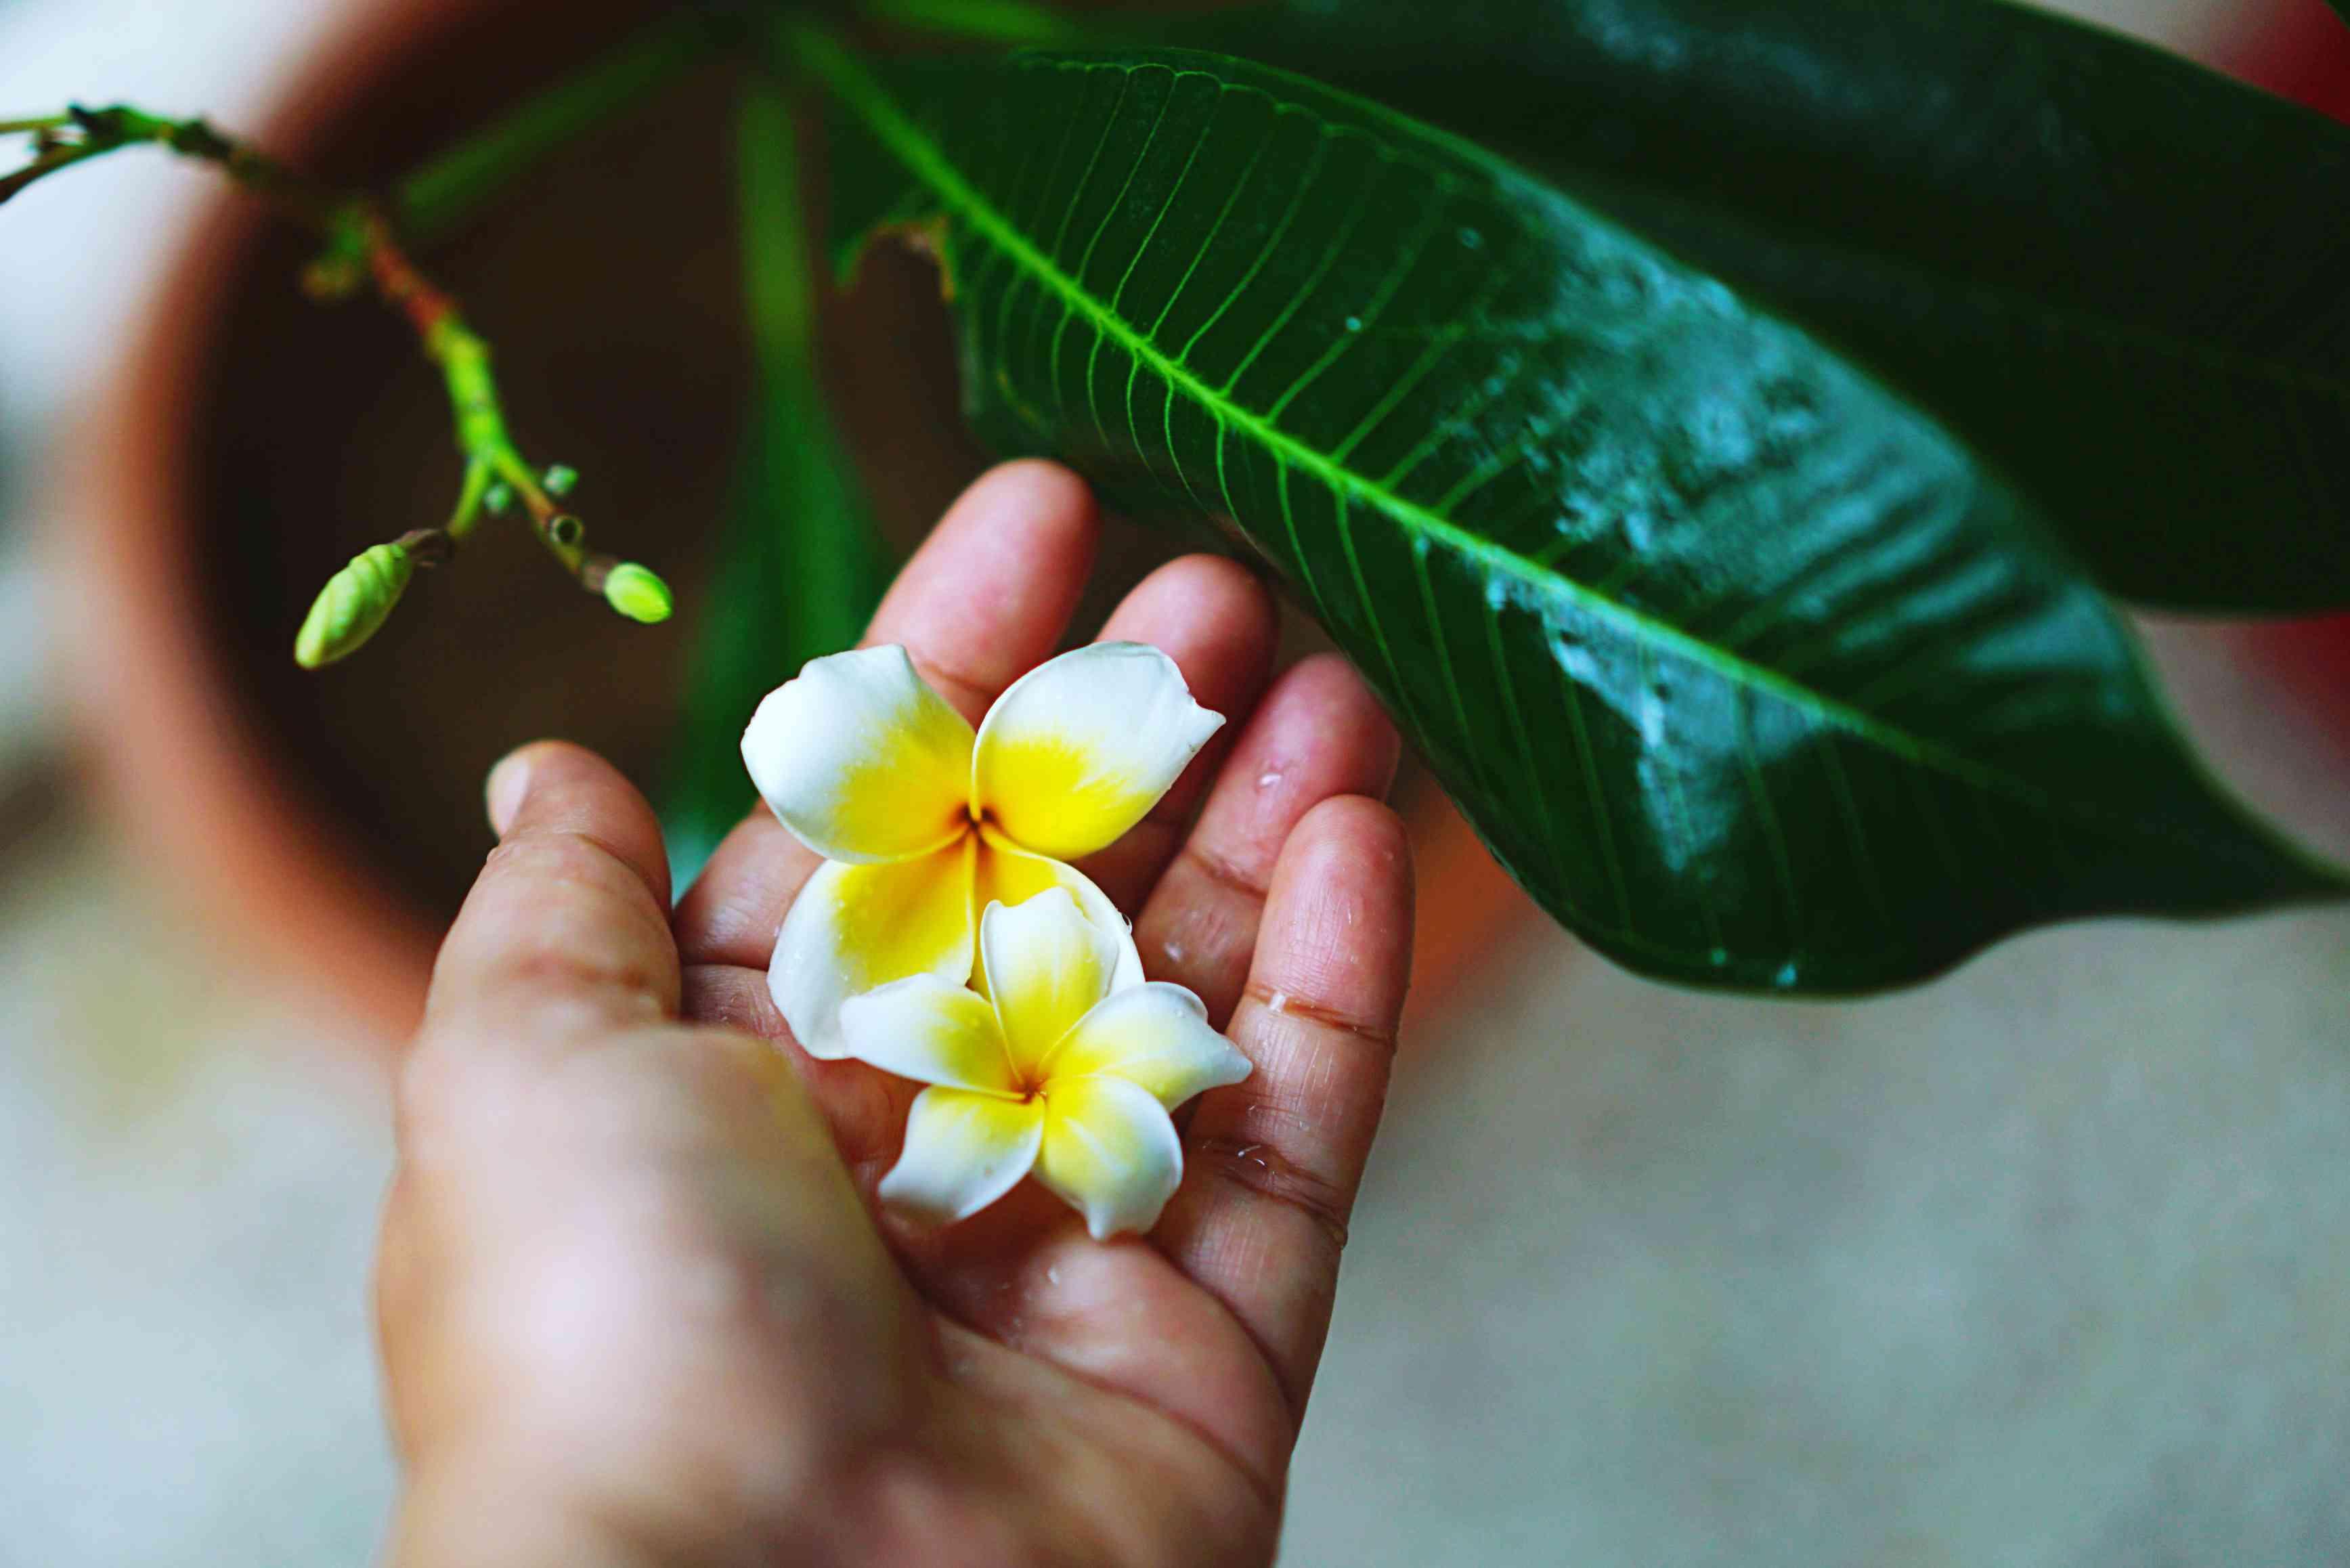 Hand holding two yellow plumeria flowers